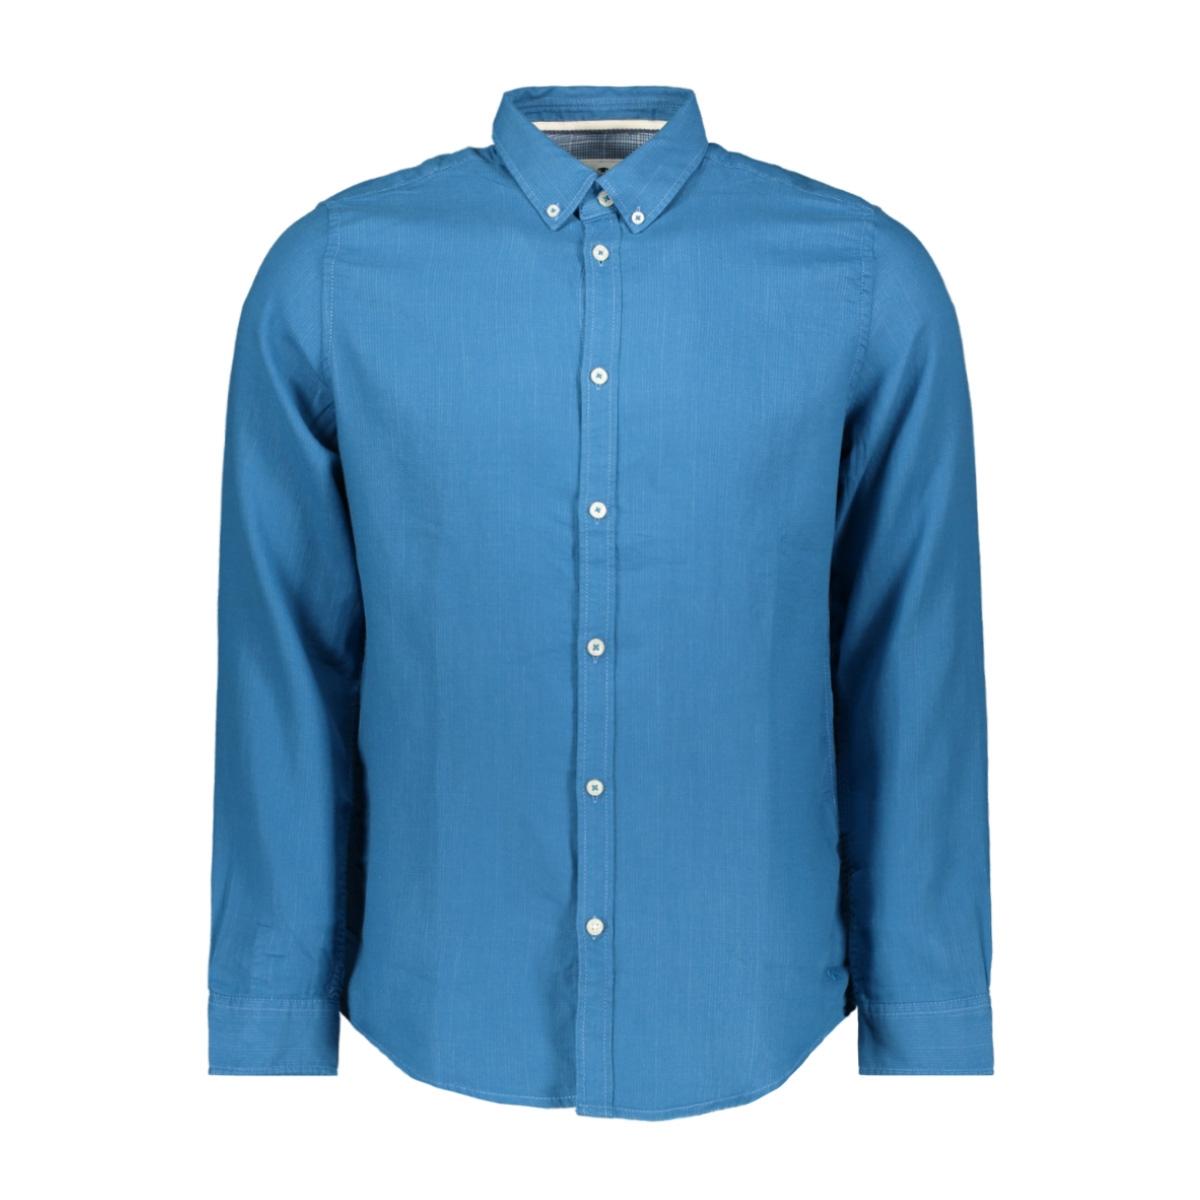 overhemd met buttondown kraag 1014474xx10 tom tailor overhemd 20197